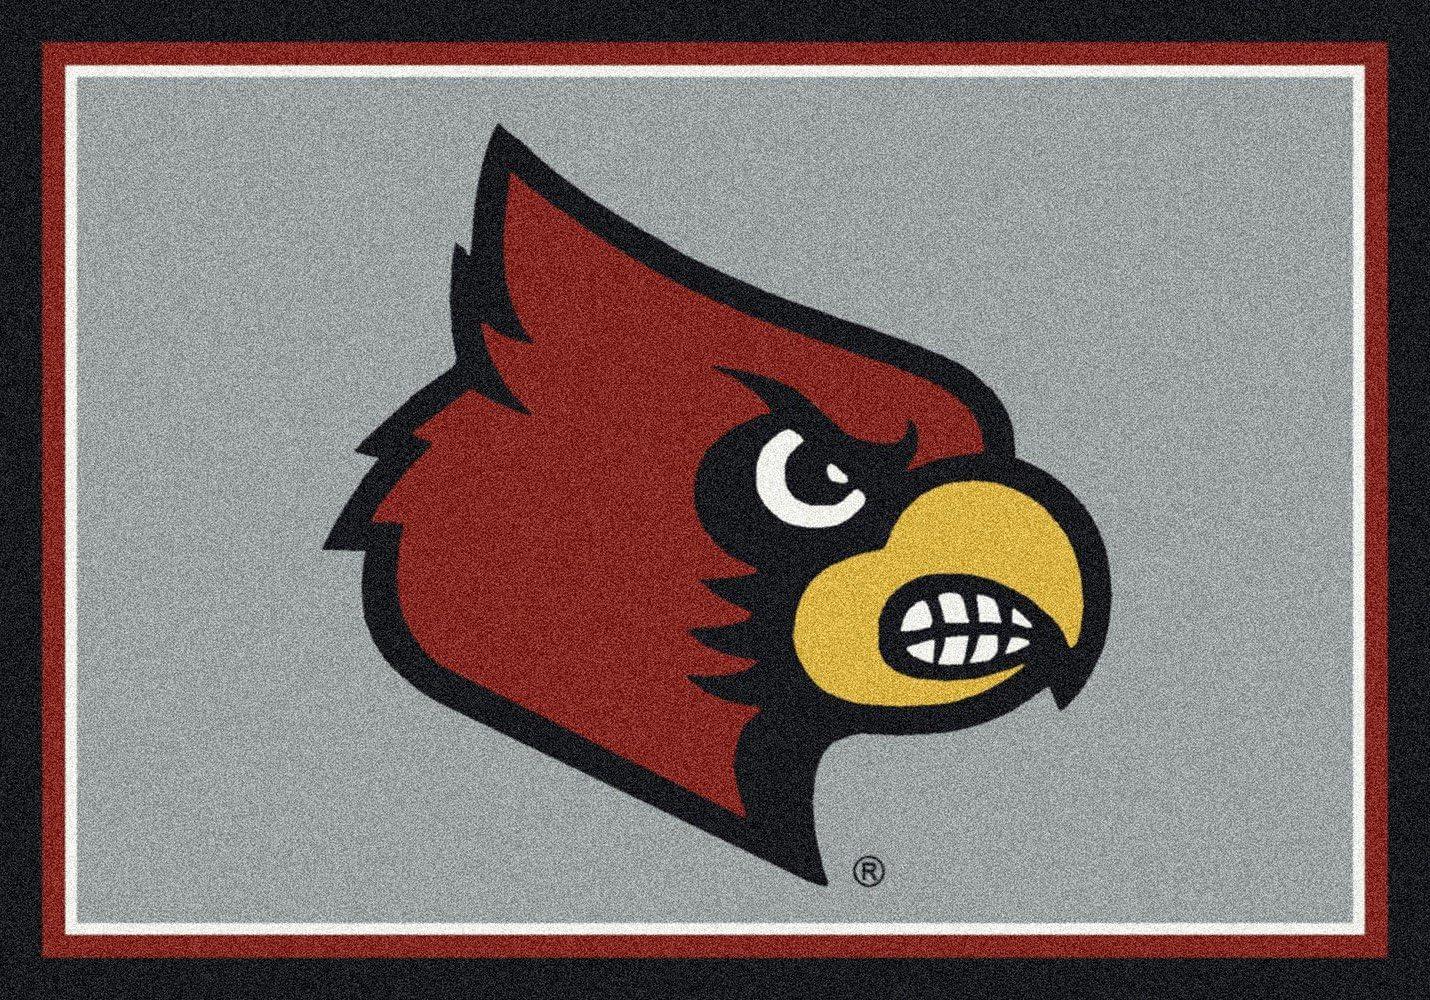 American Floor Mats Louisville Cardinals 4 years warranty NCAA Spiri Team College Popular brand in the world